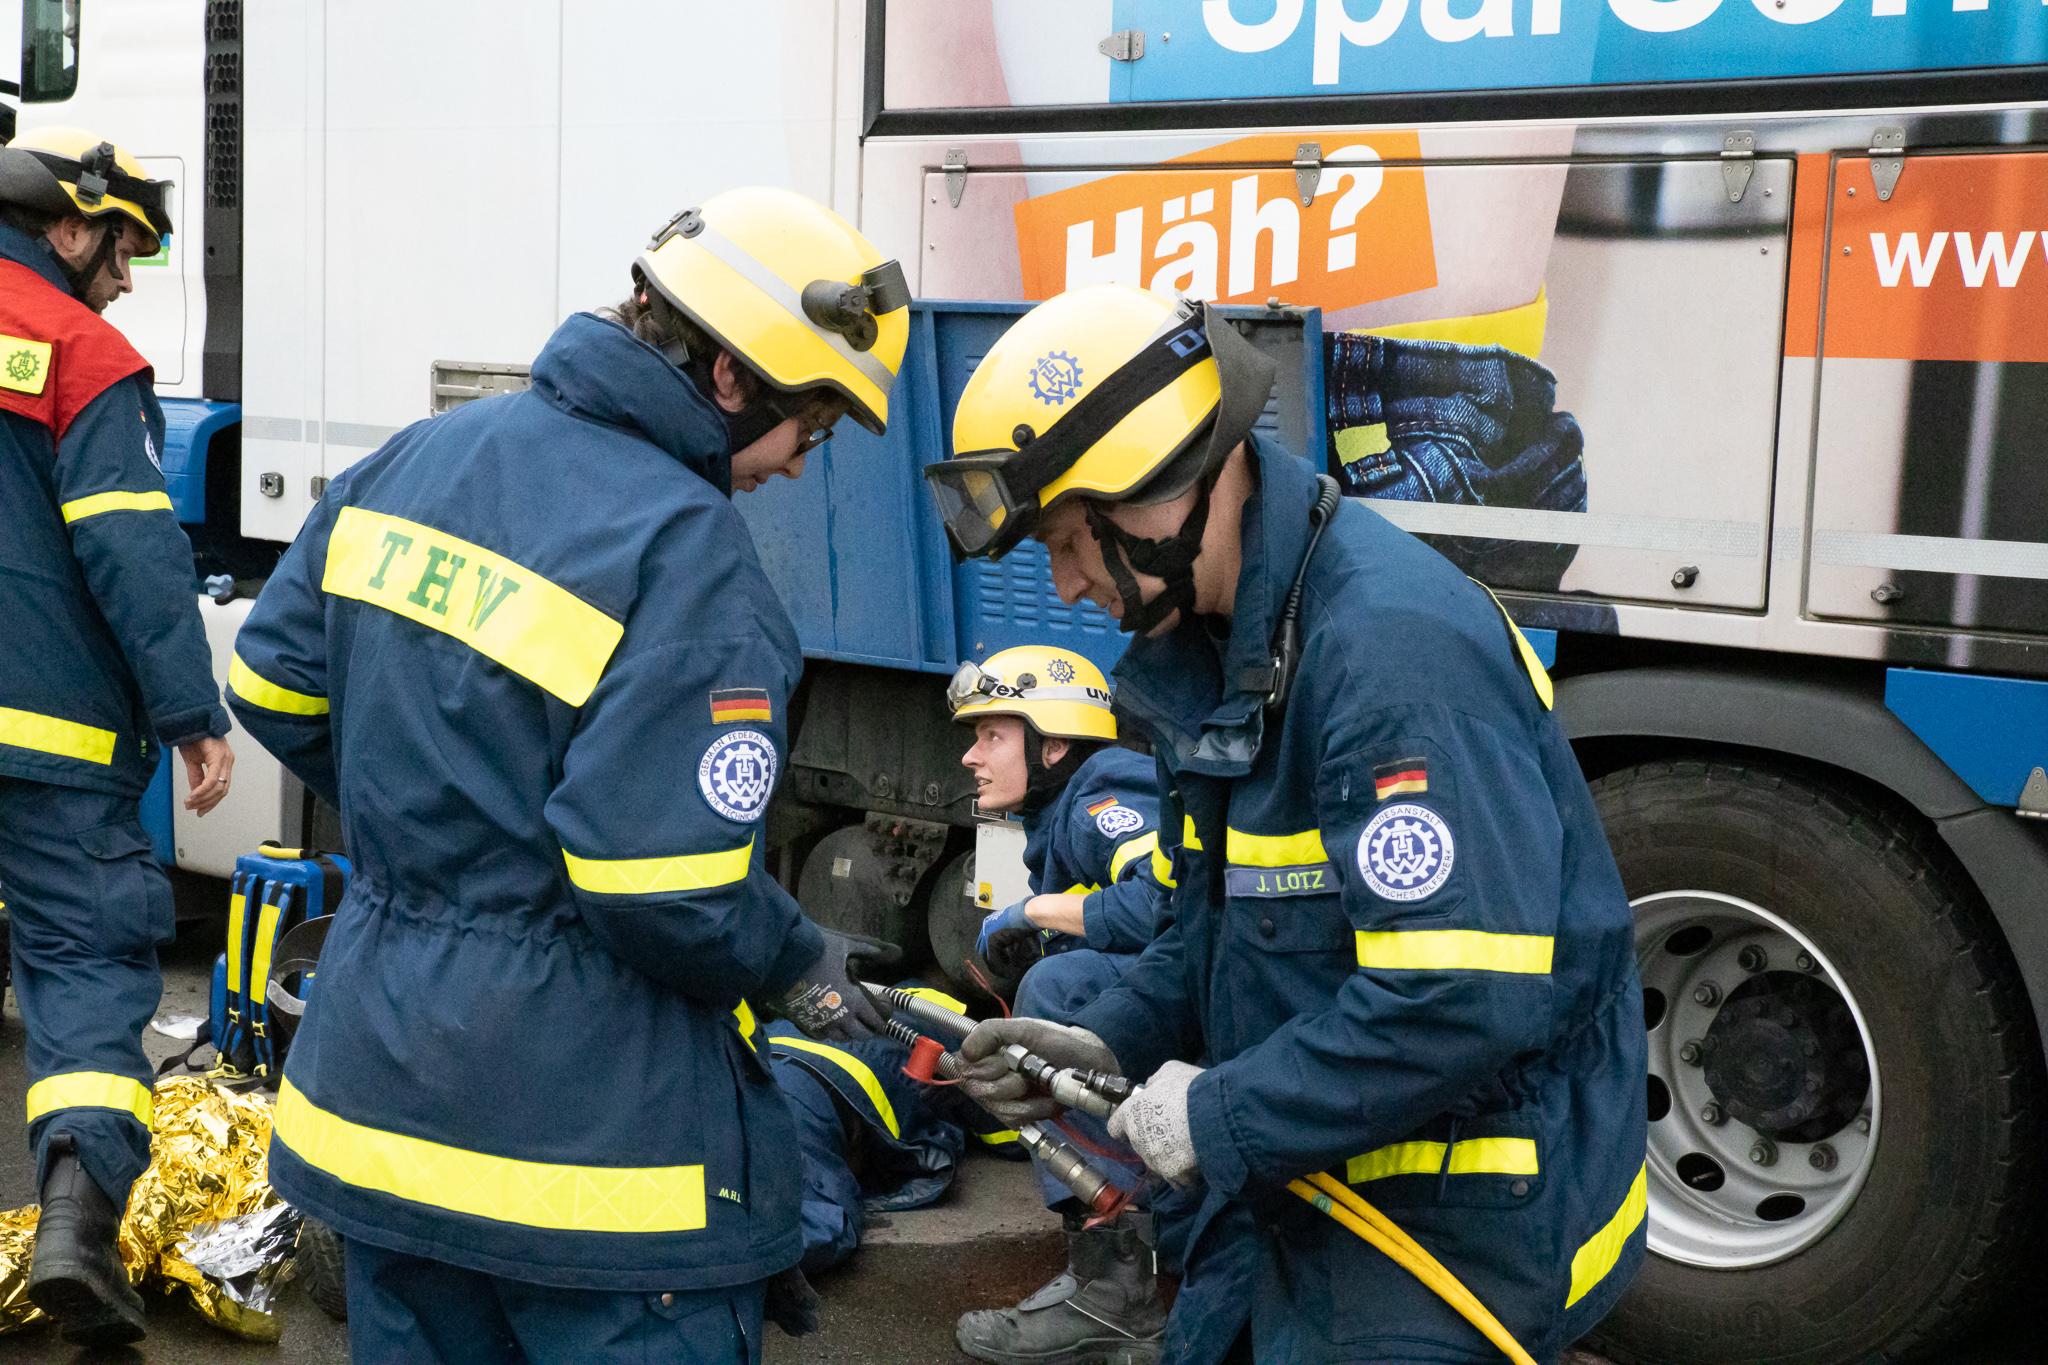 FeuerwehrSim 2019 Henckackerweg-15